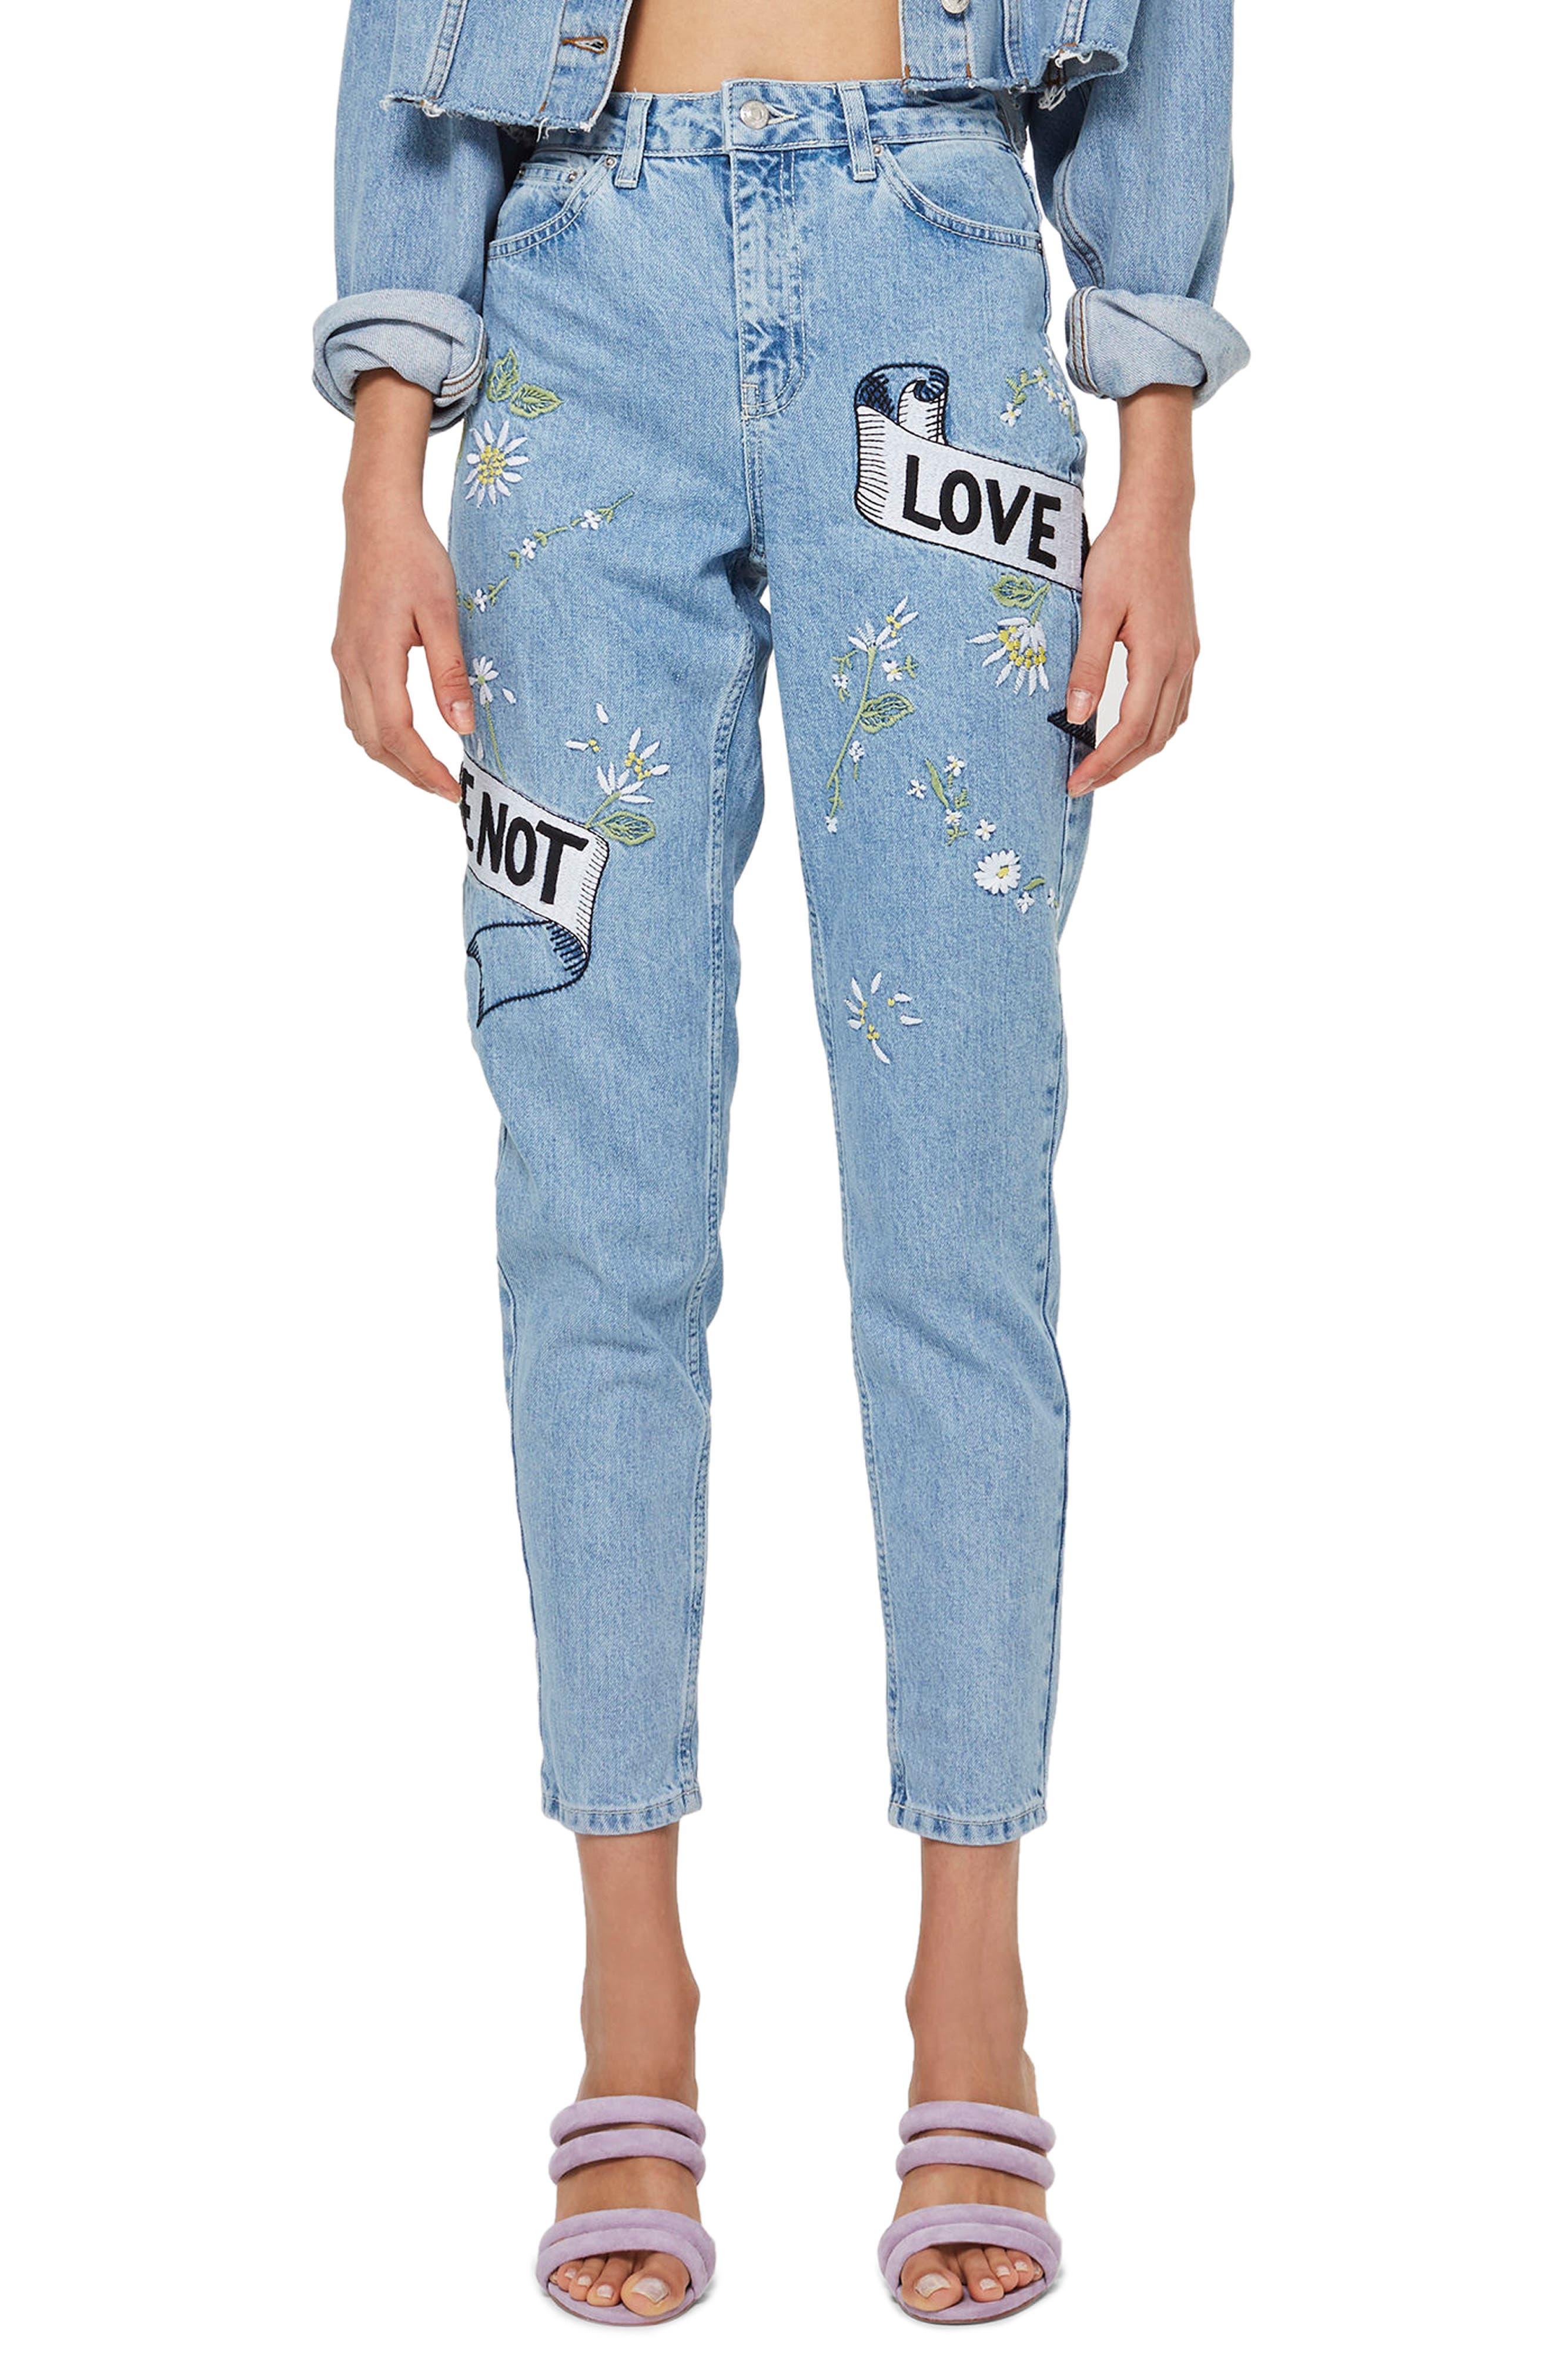 Topshop Love Me Bleach Mom Jeans